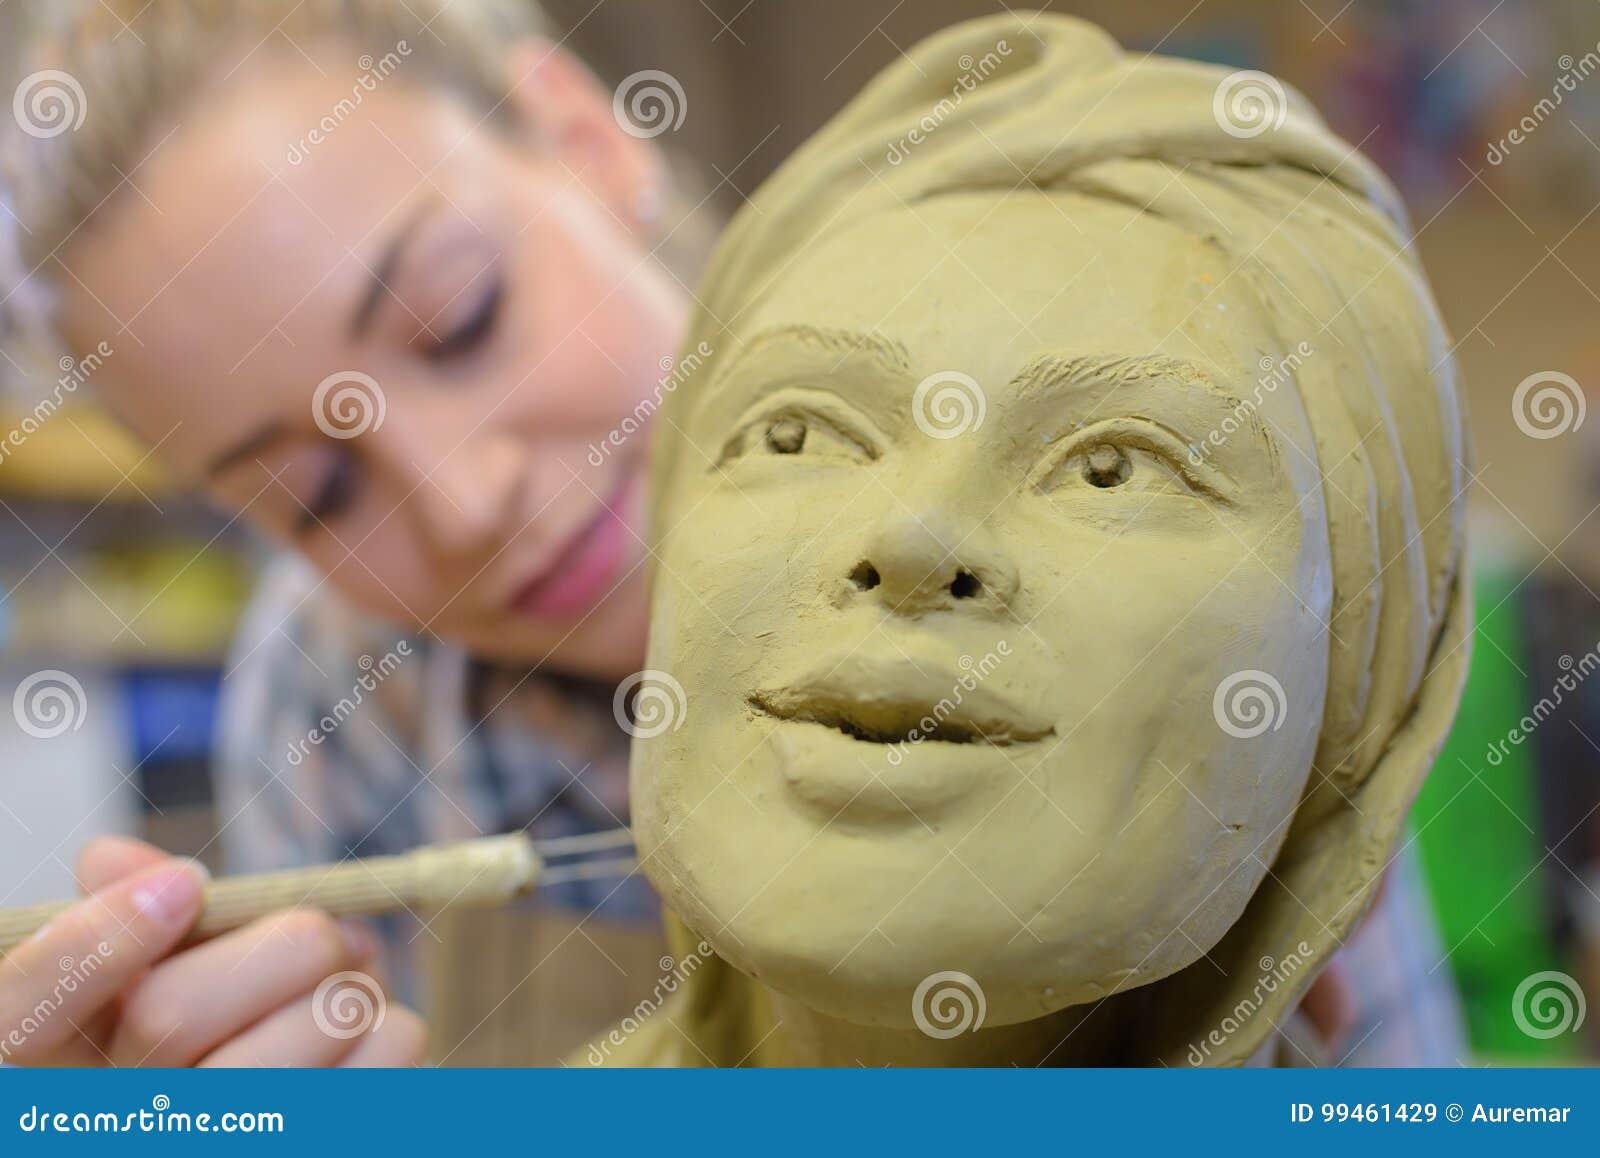 Woman making ceramic face in art class